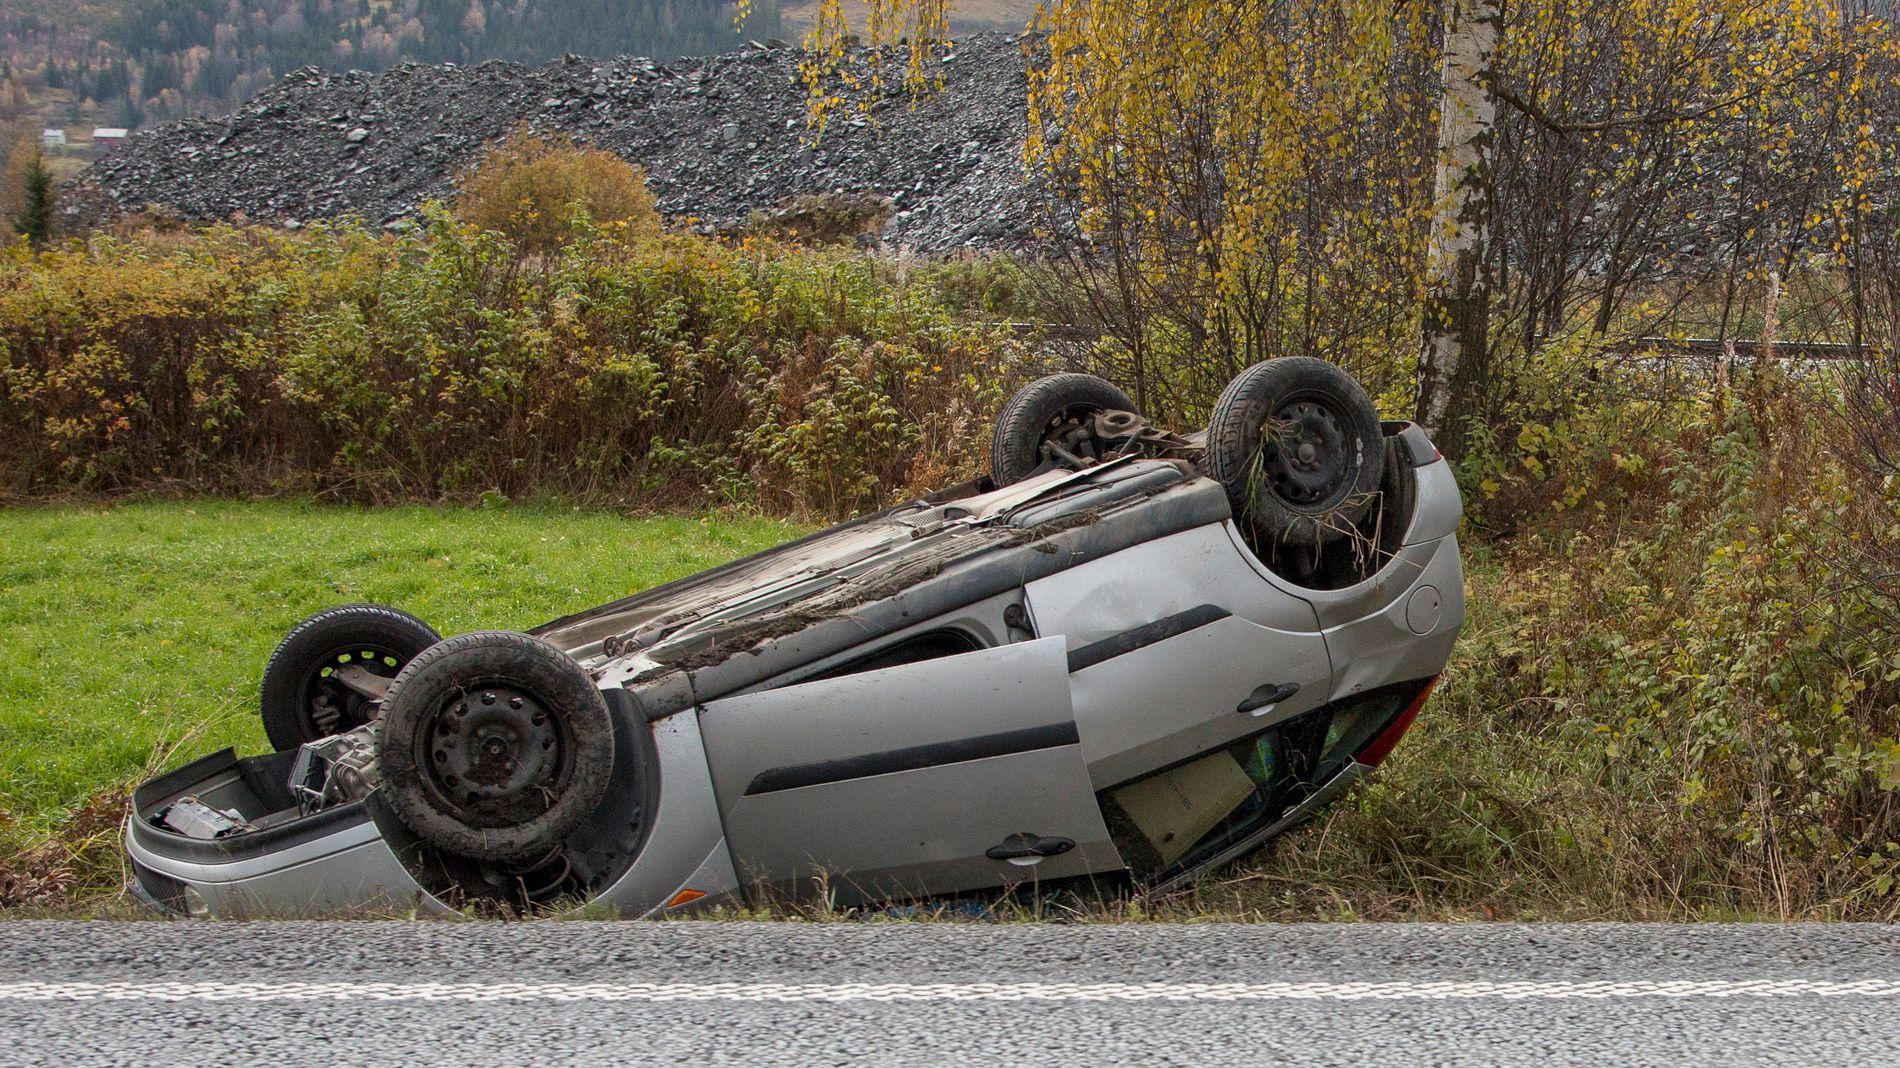 BILFORSIKRING MEST OVERPRISET: Undersøkelsen viser at forsikringsmeglerne mener bilforsikringer er aller mest overpriset. Hele 40 prosent svarer at bilforsikring er overpriset, opp fra 31 prosent i 2017.